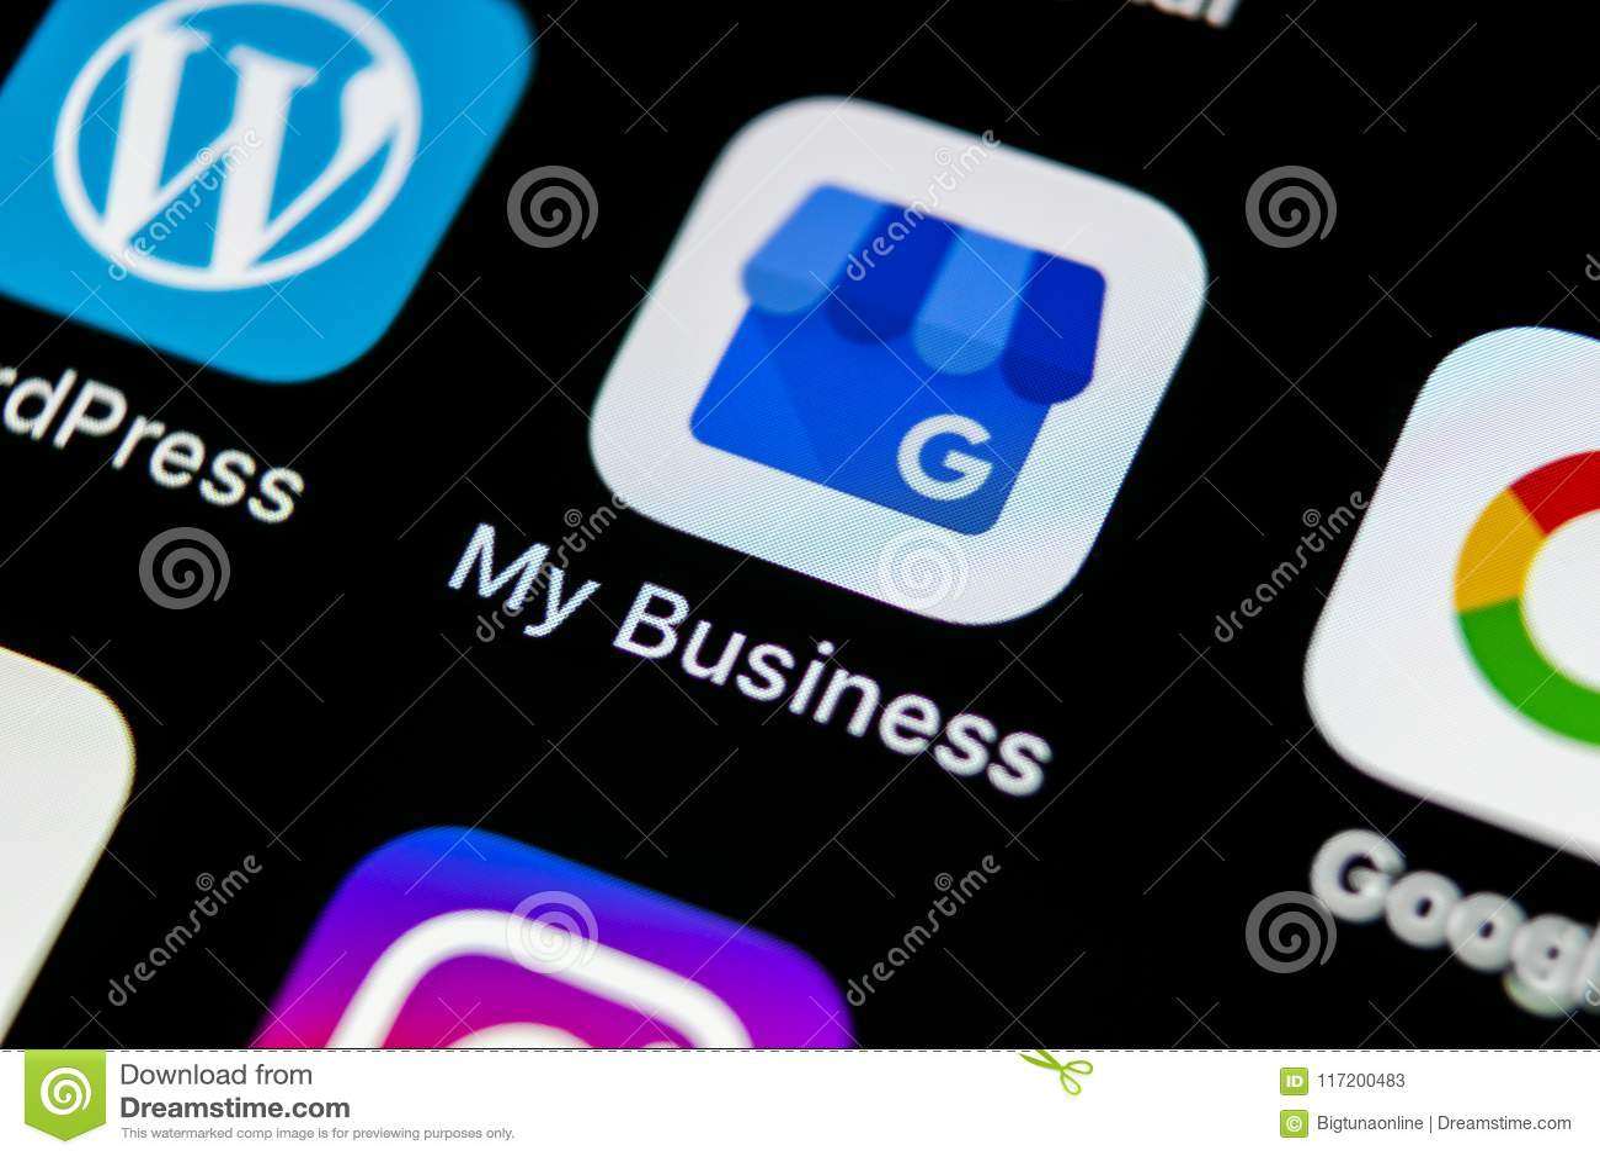 Google το εικονίδιο επιχειρηματικής εφαρμογής μου στο iPhone Χ της Apple κινηματογράφηση σε πρώτο πλάνο οθόνης Google το επιχειρη